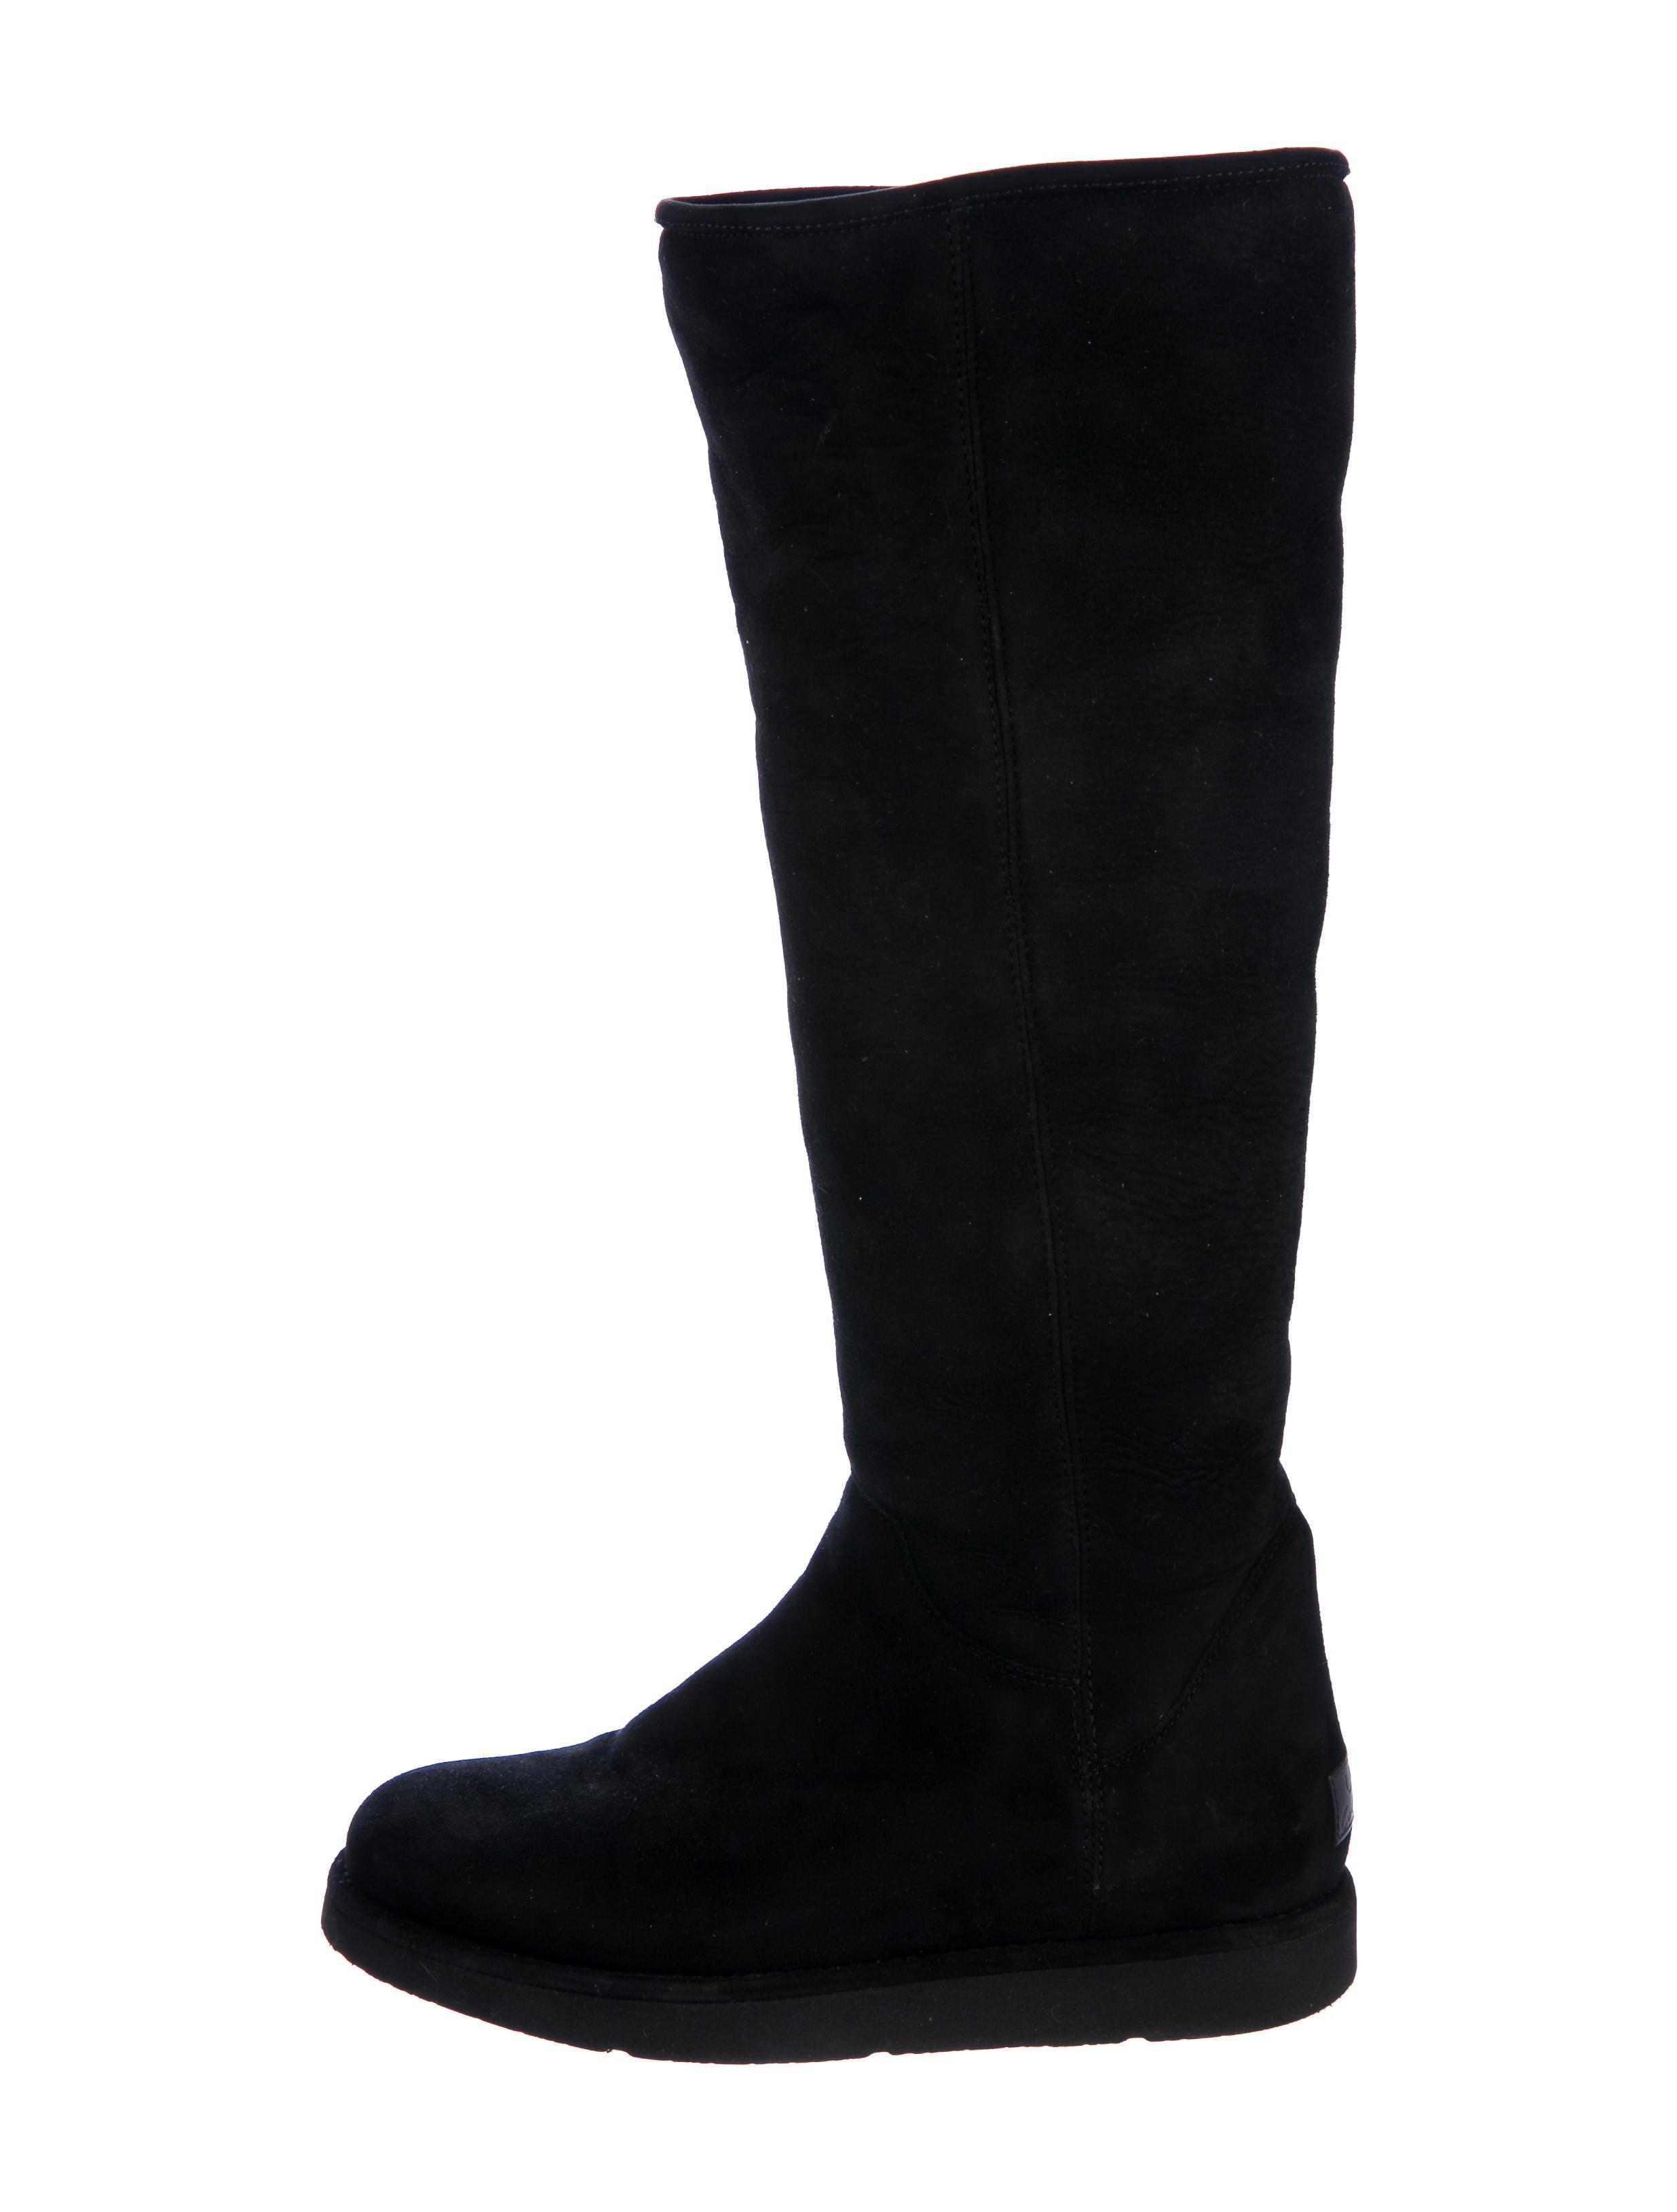 23971812507 Ugg australia carmela knee high boots shoes wuugg jpg 2471x3260 Ugg carmela